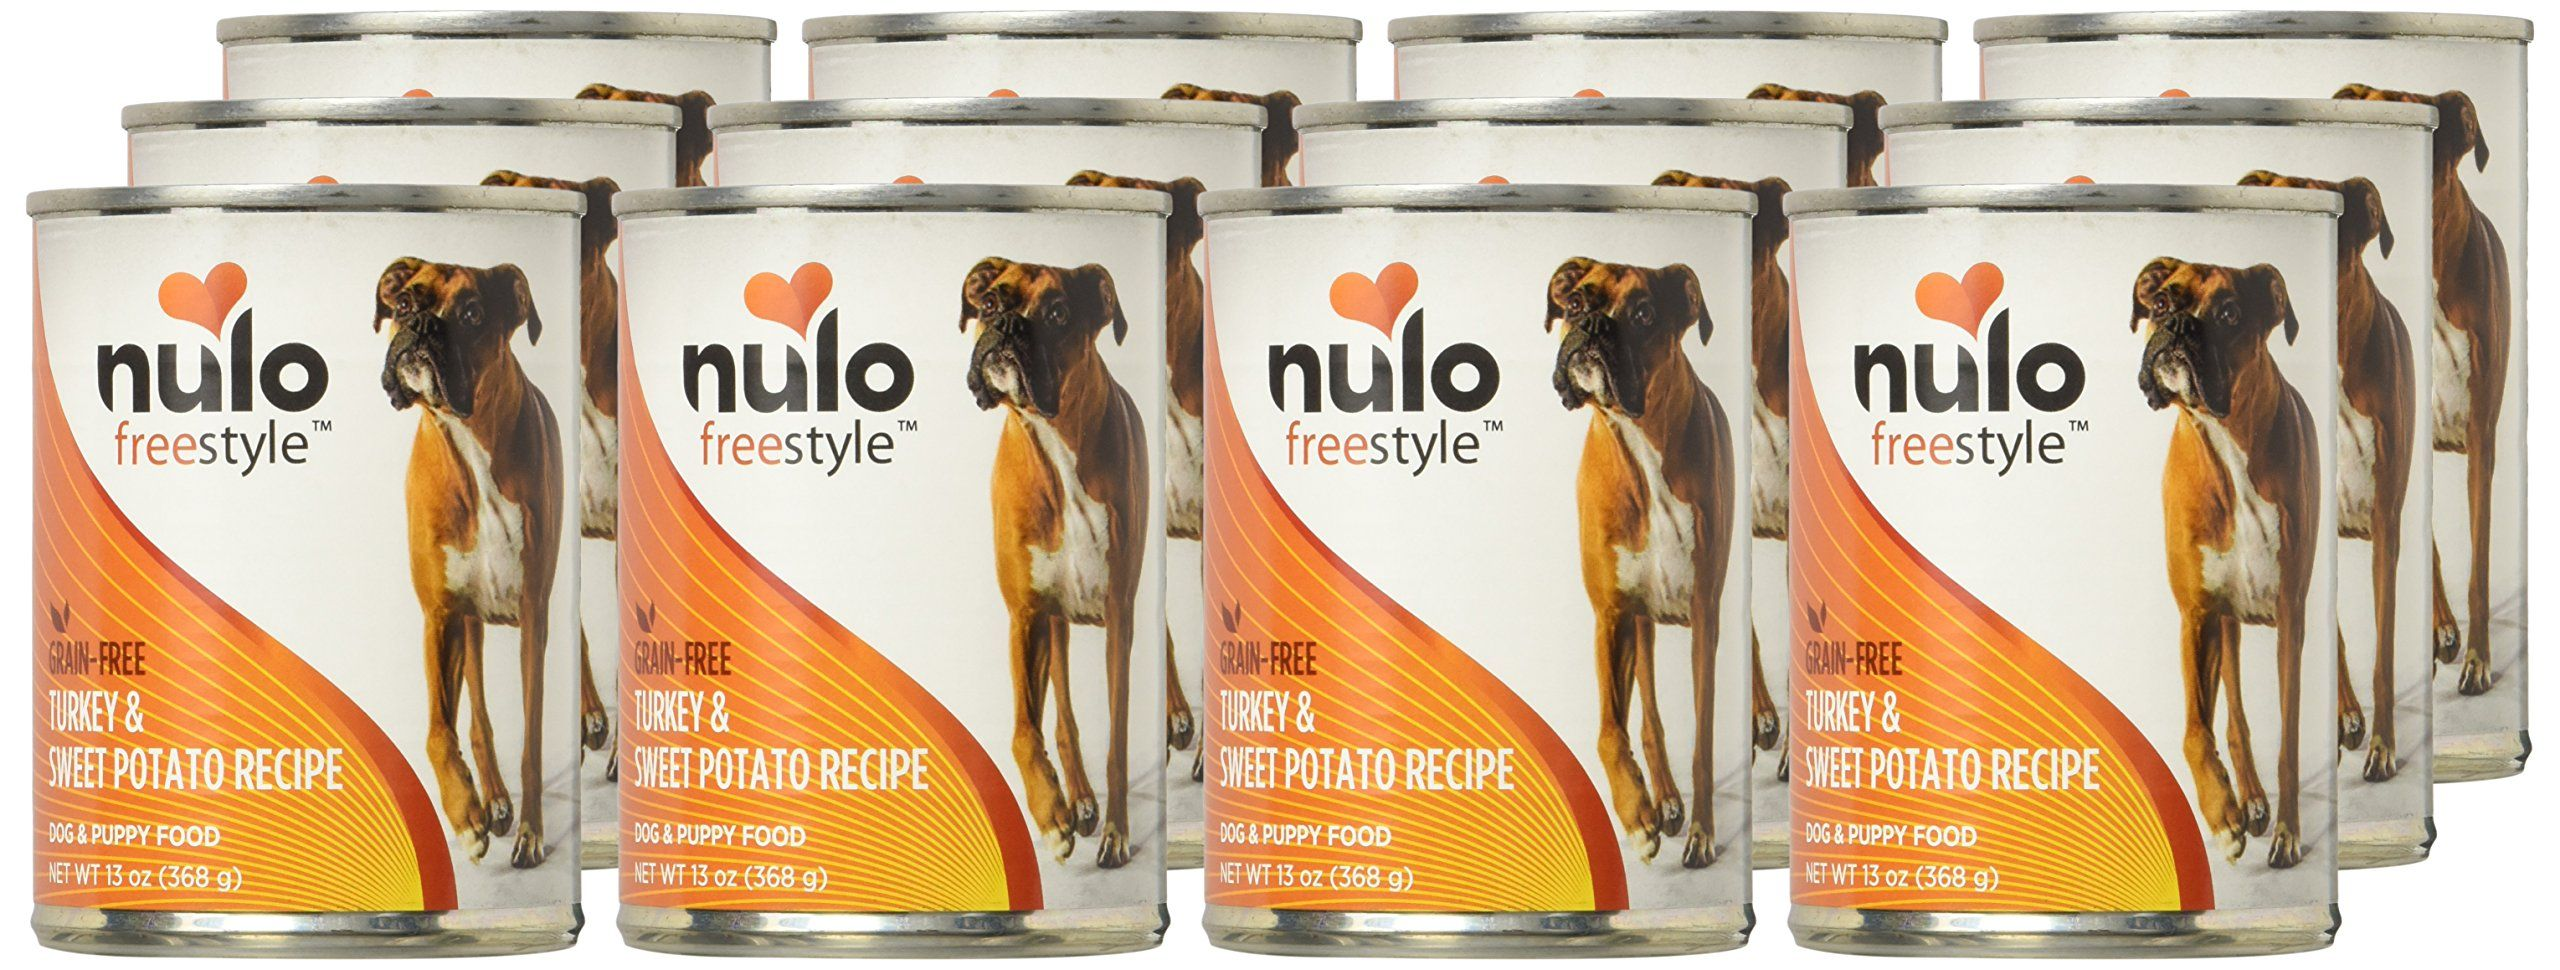 Nulo Freestyle Turkey And Sweet Potato Recipe Can Dog 12 13 Oz